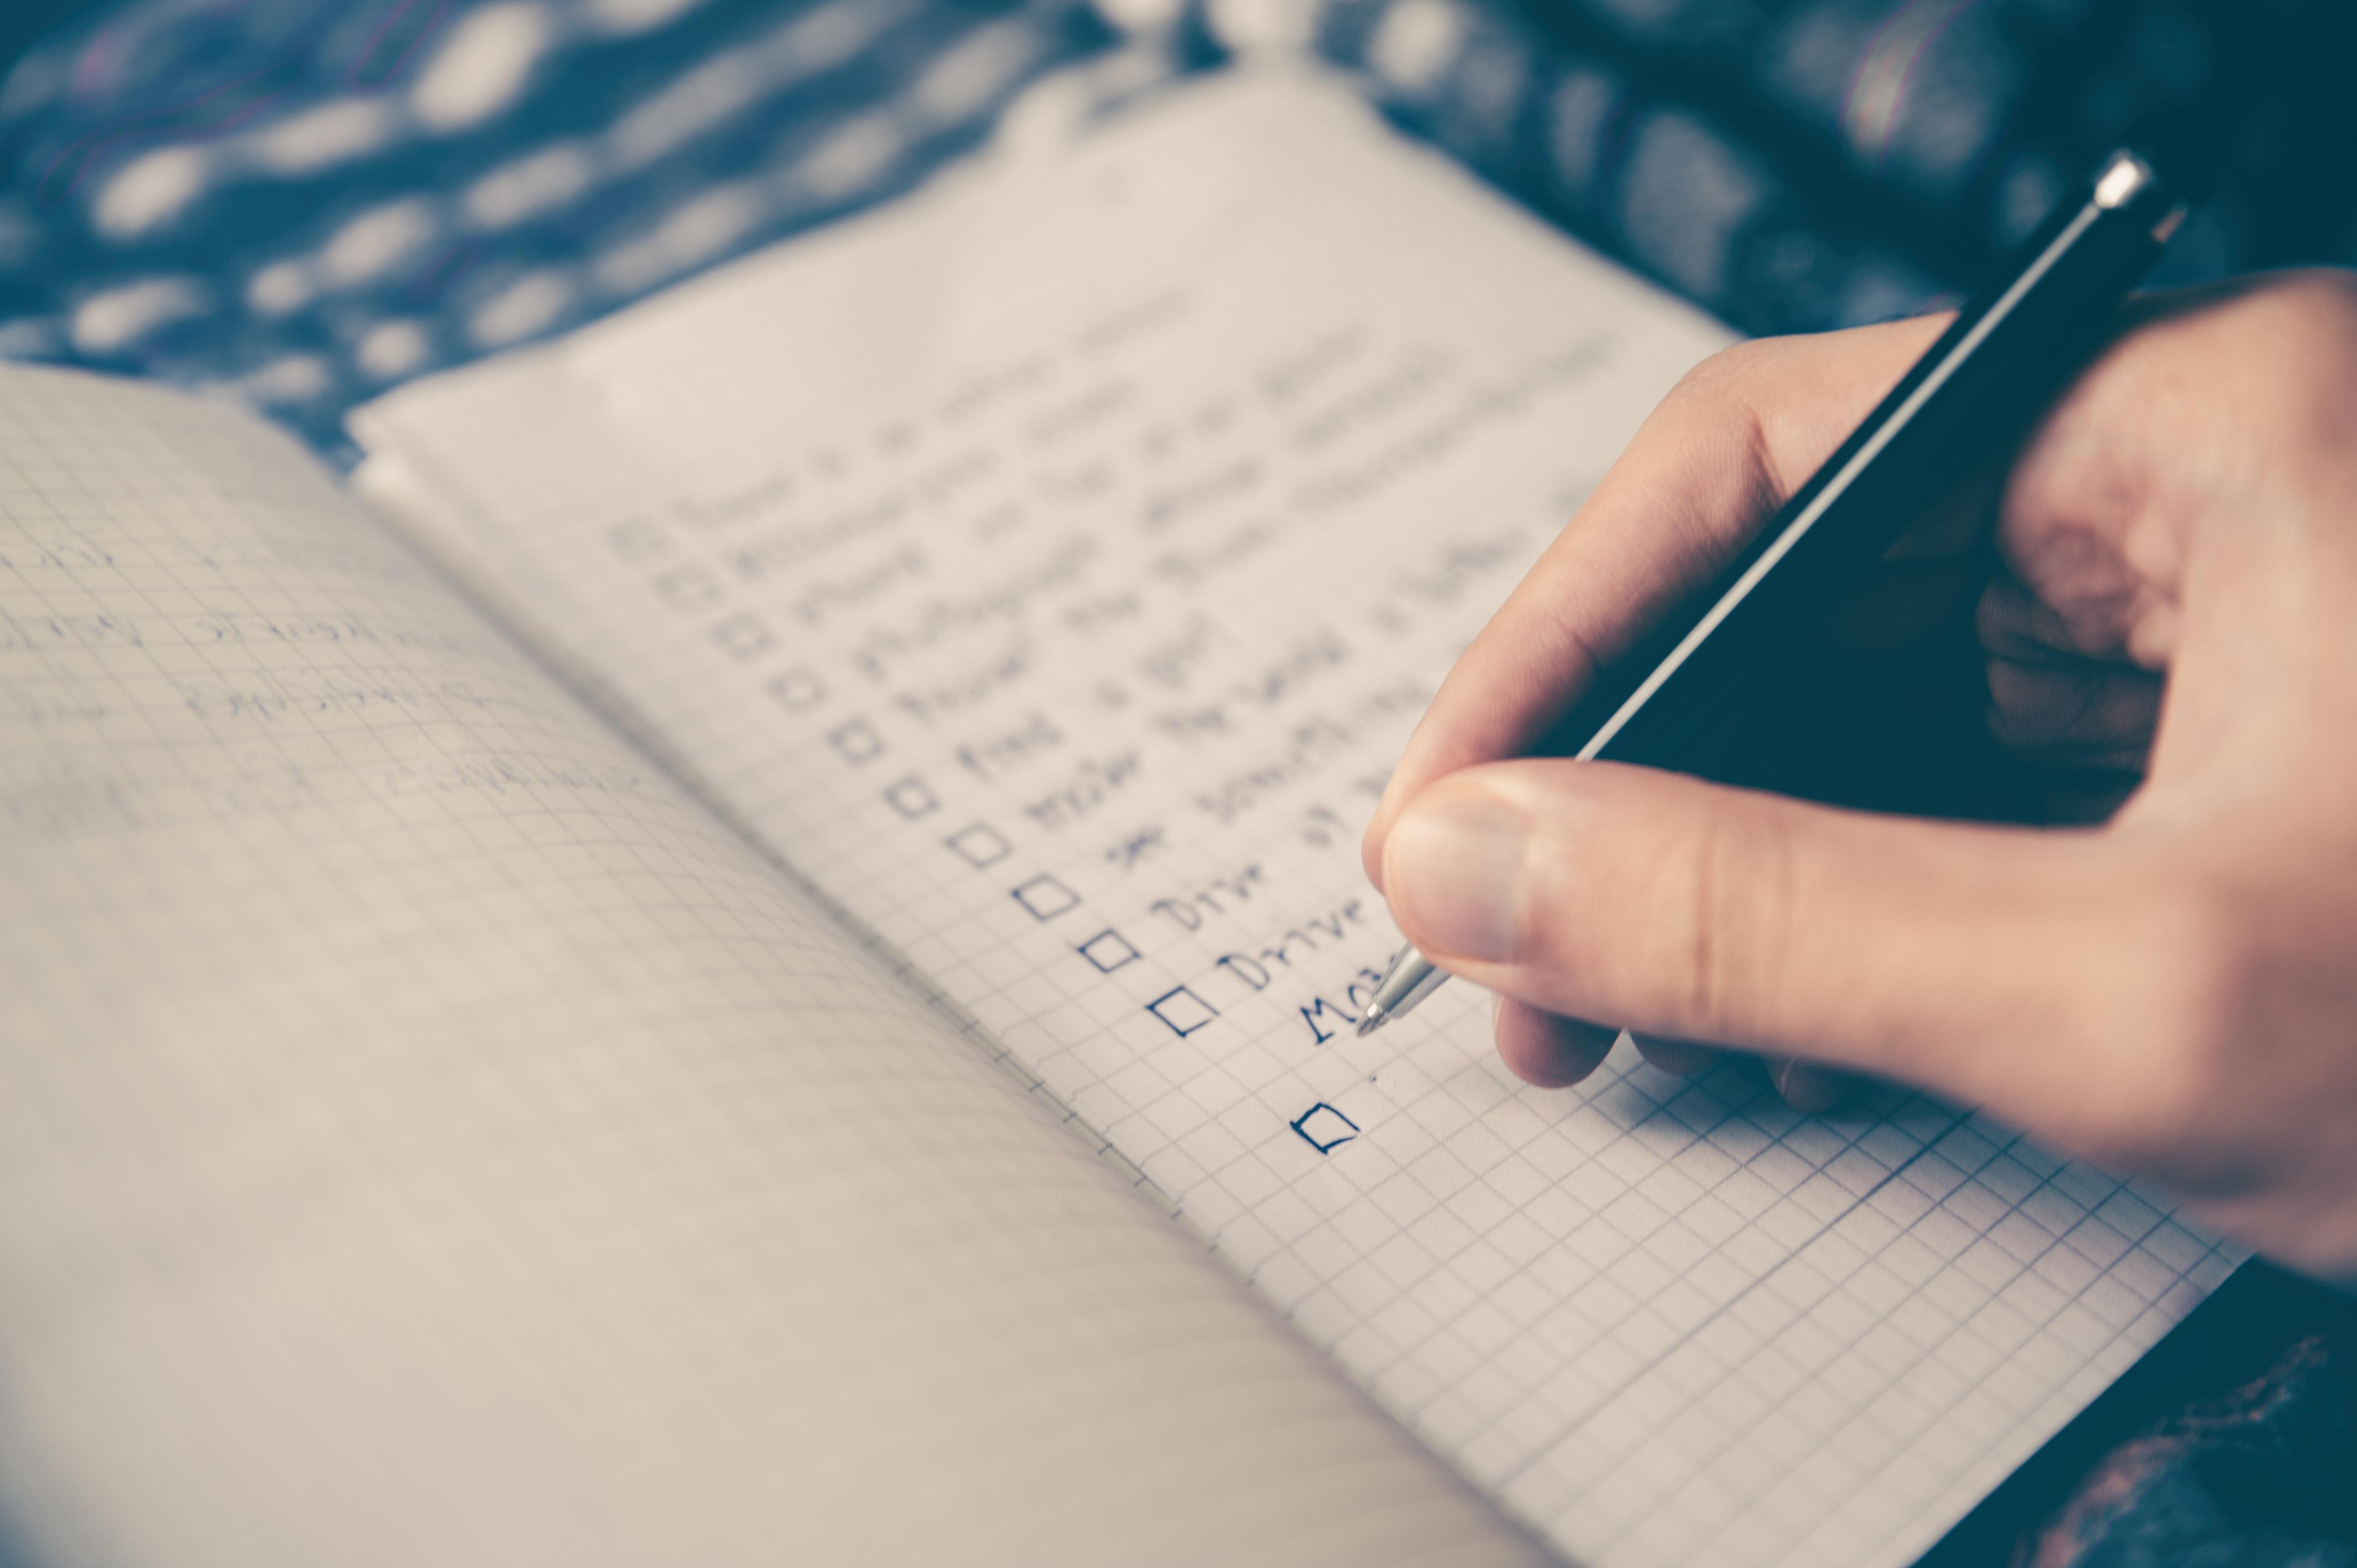 to-do list being written